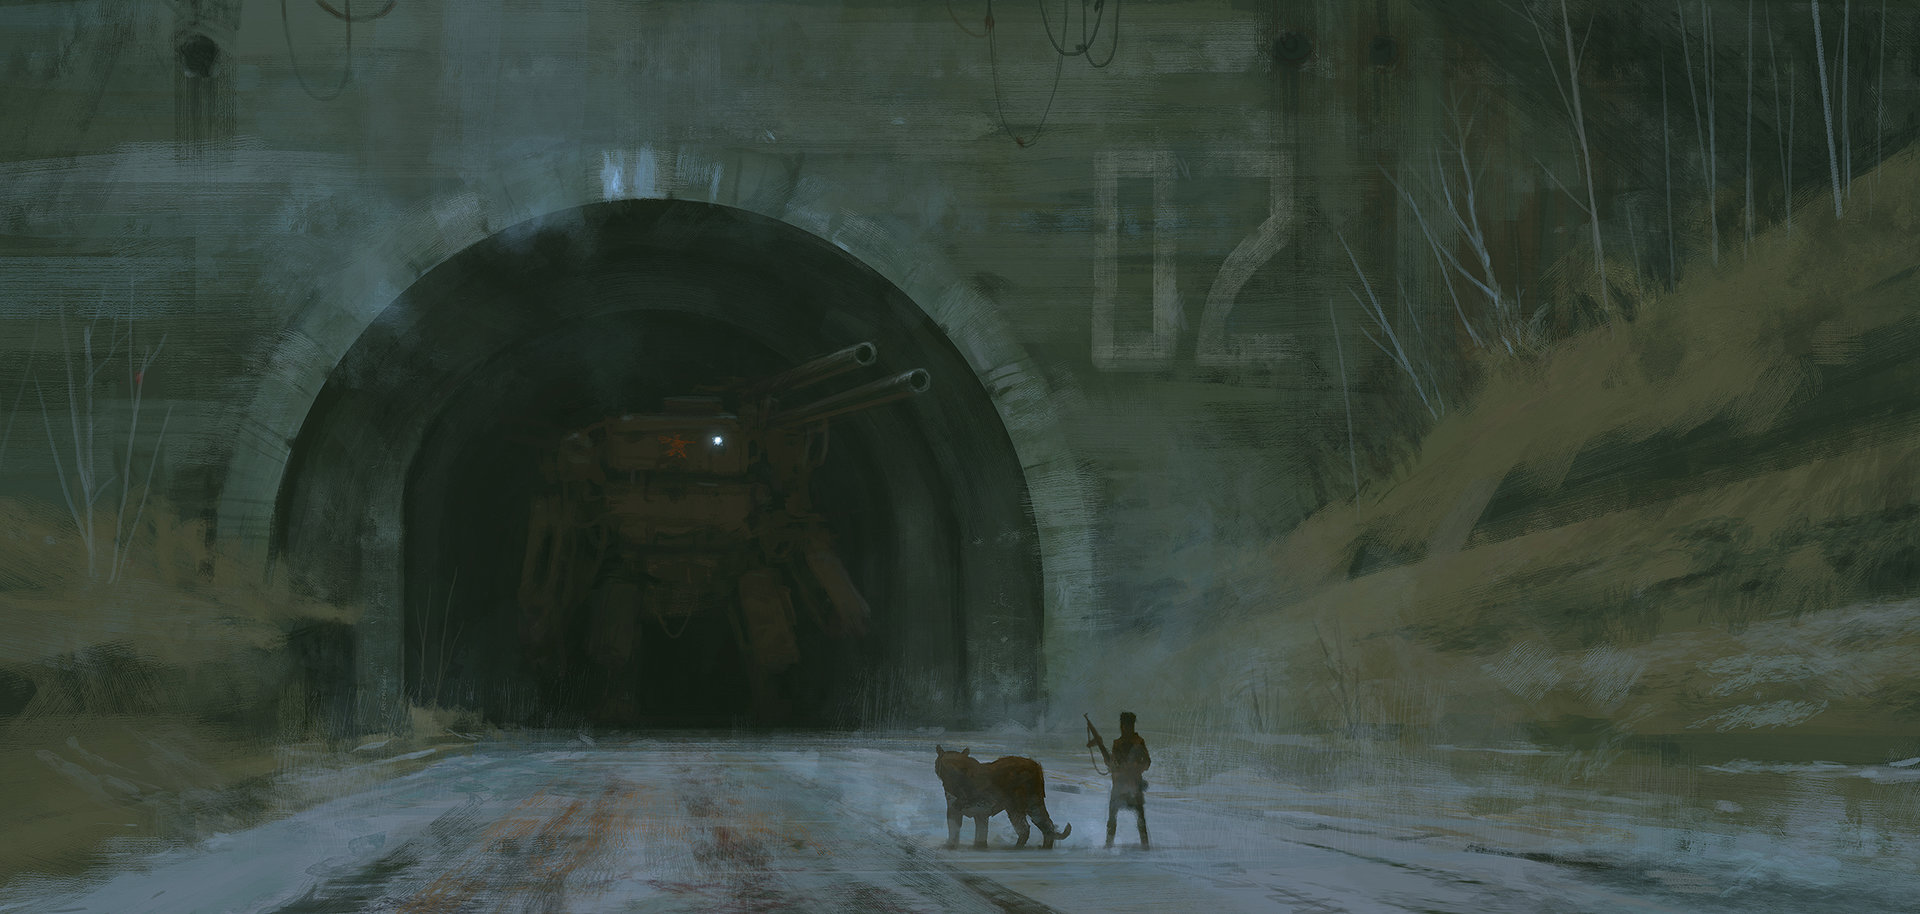 Jakub rozalski tunel and mech 01s